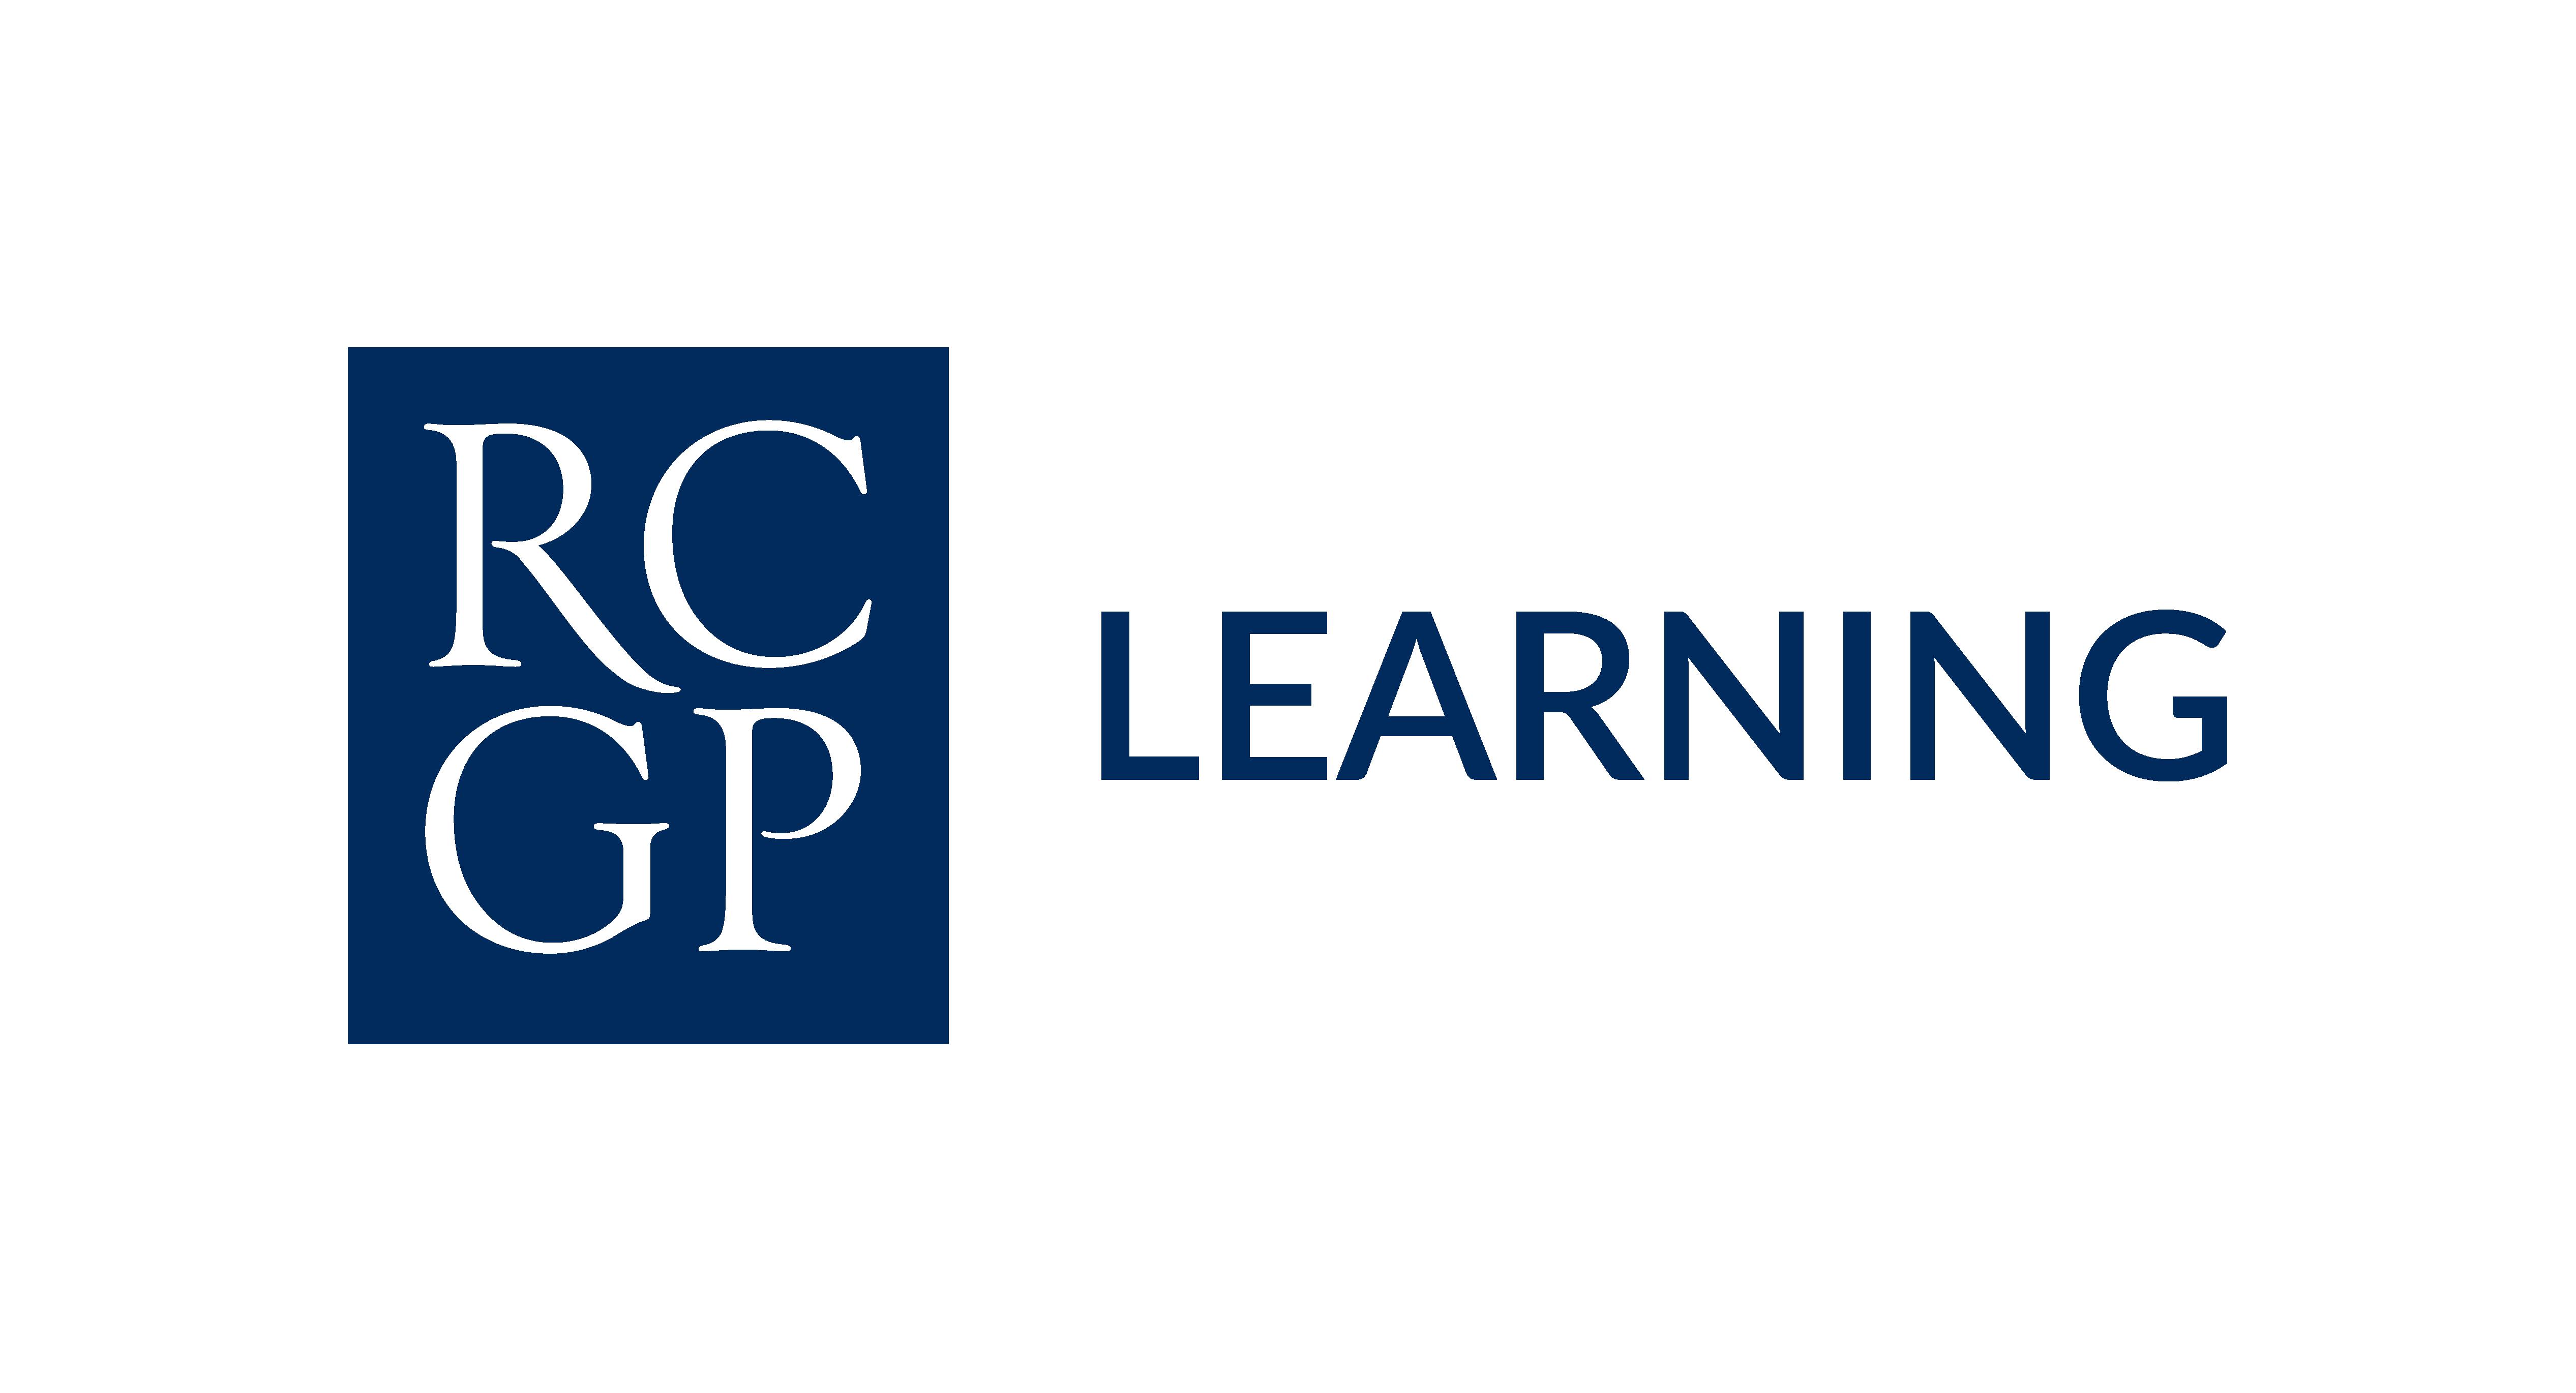 RCGP Learning